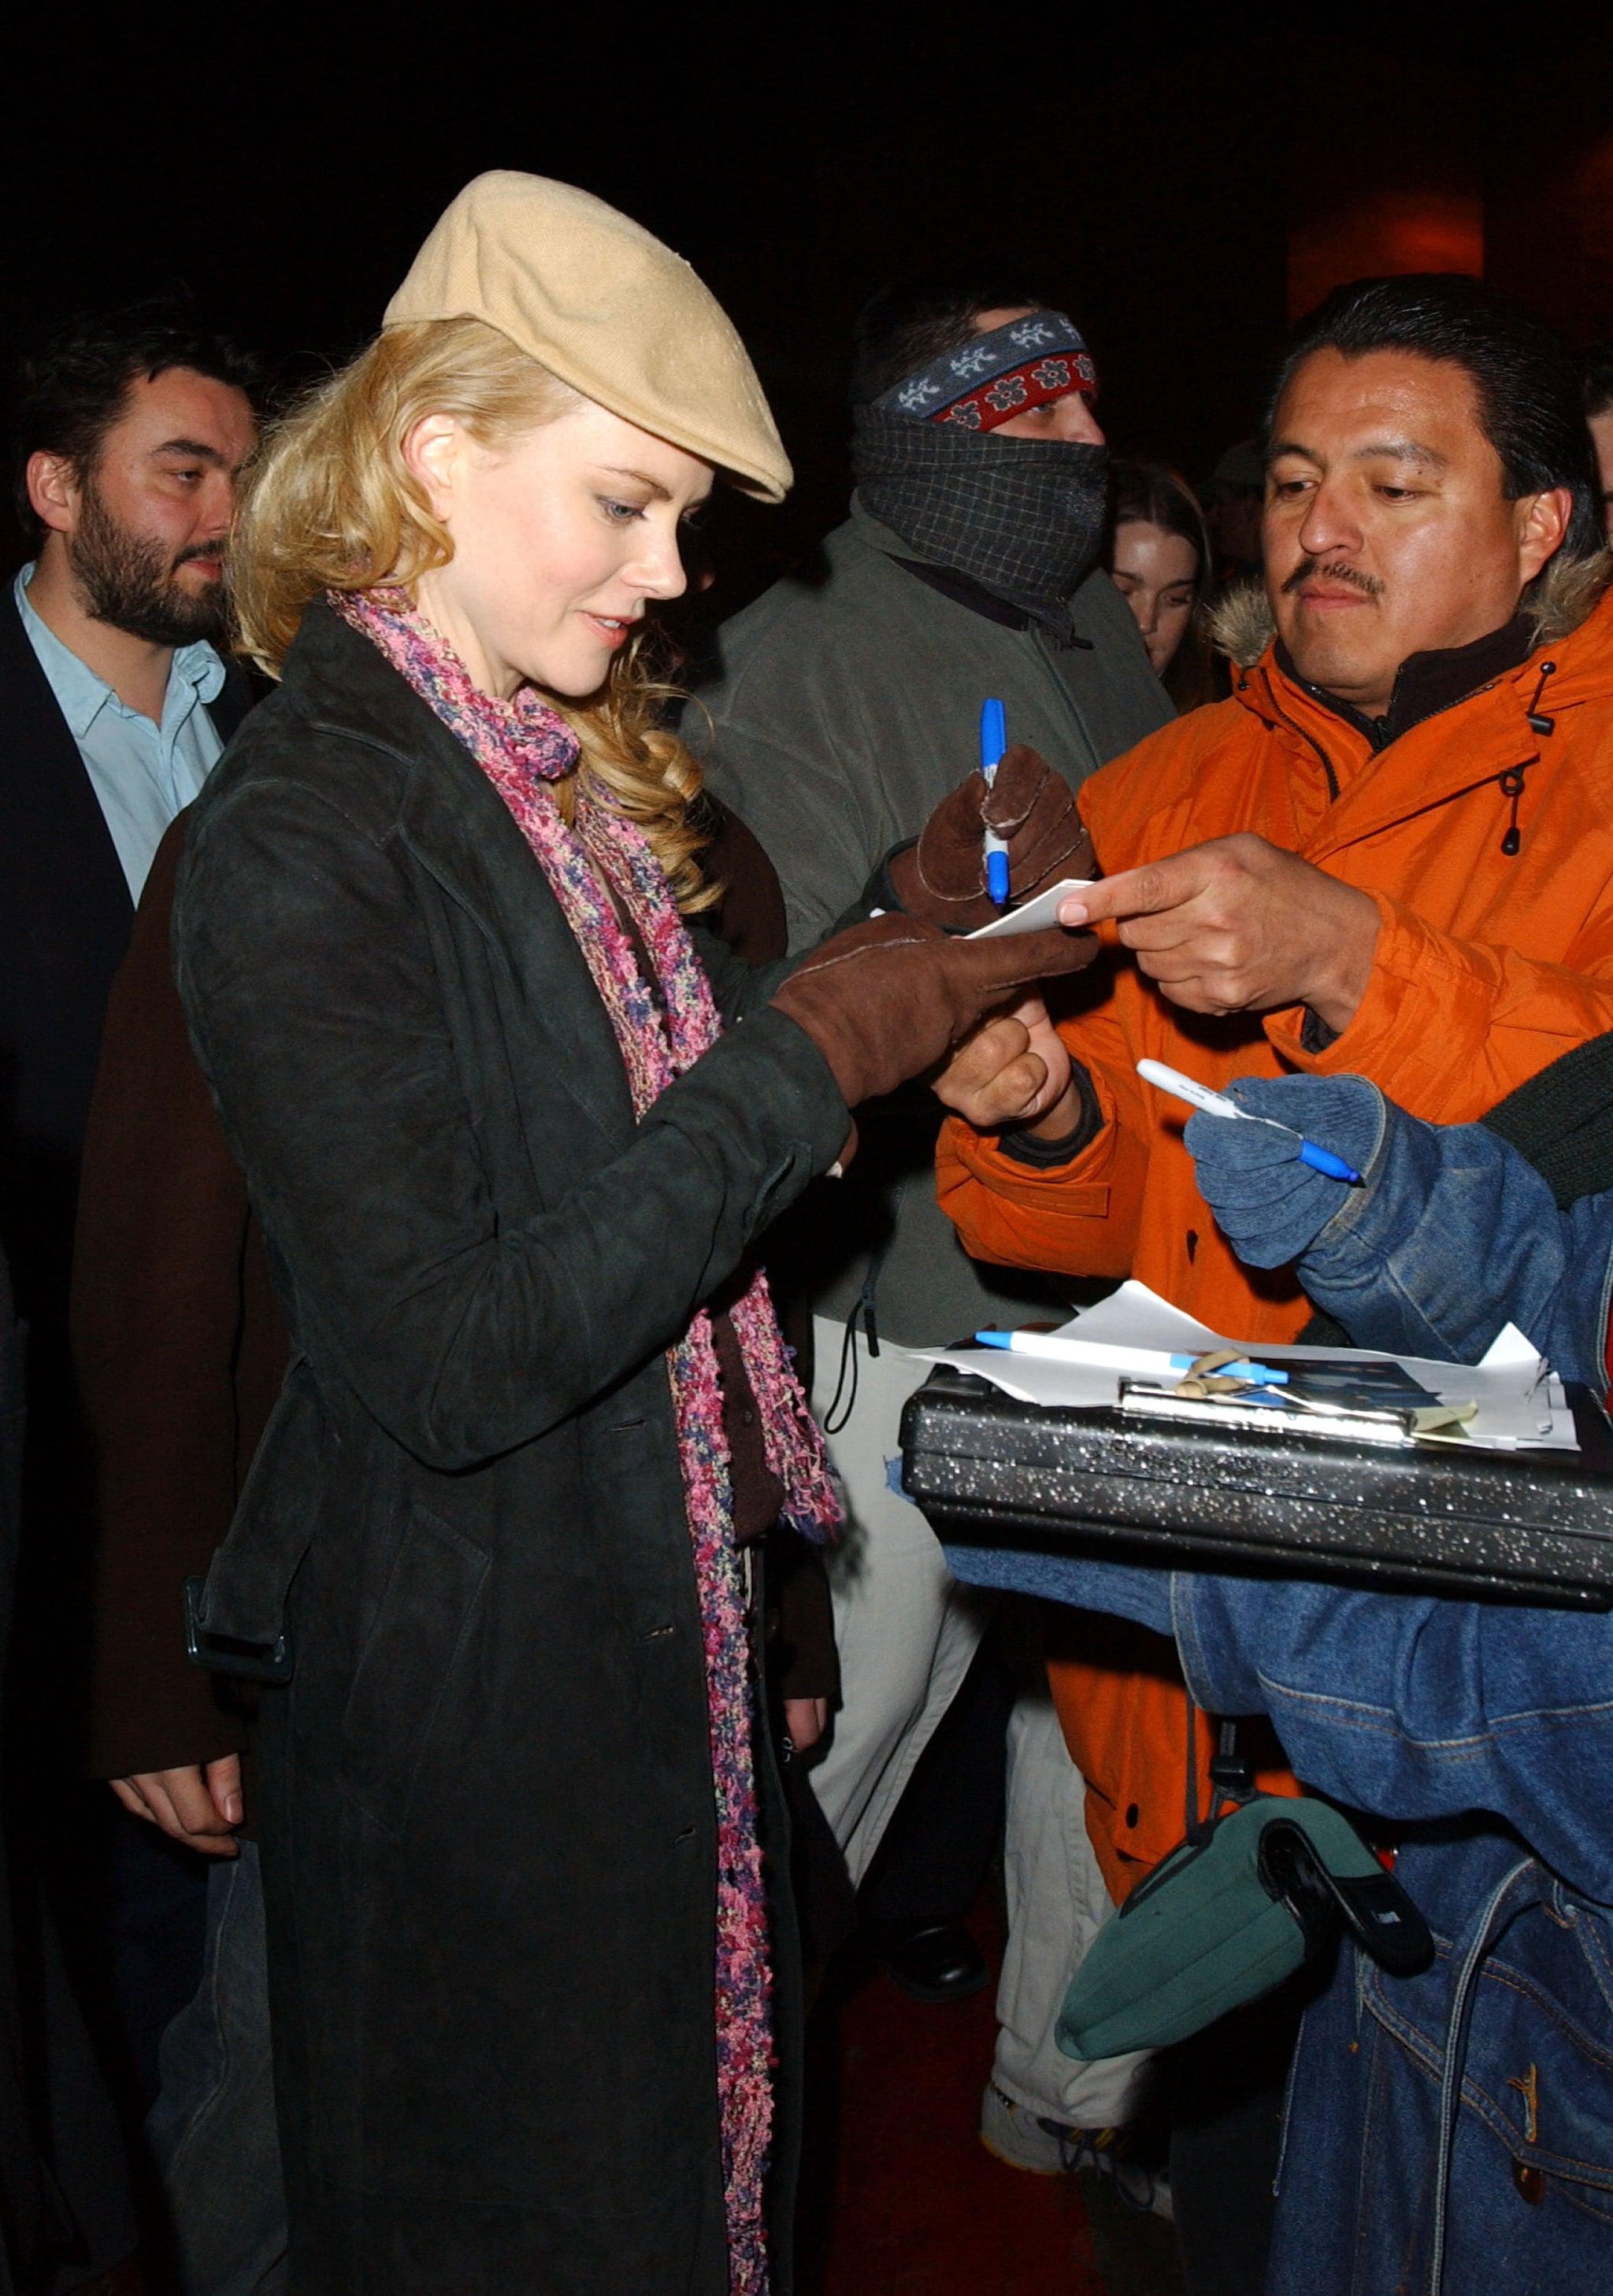 Singing Autographs at Sundance